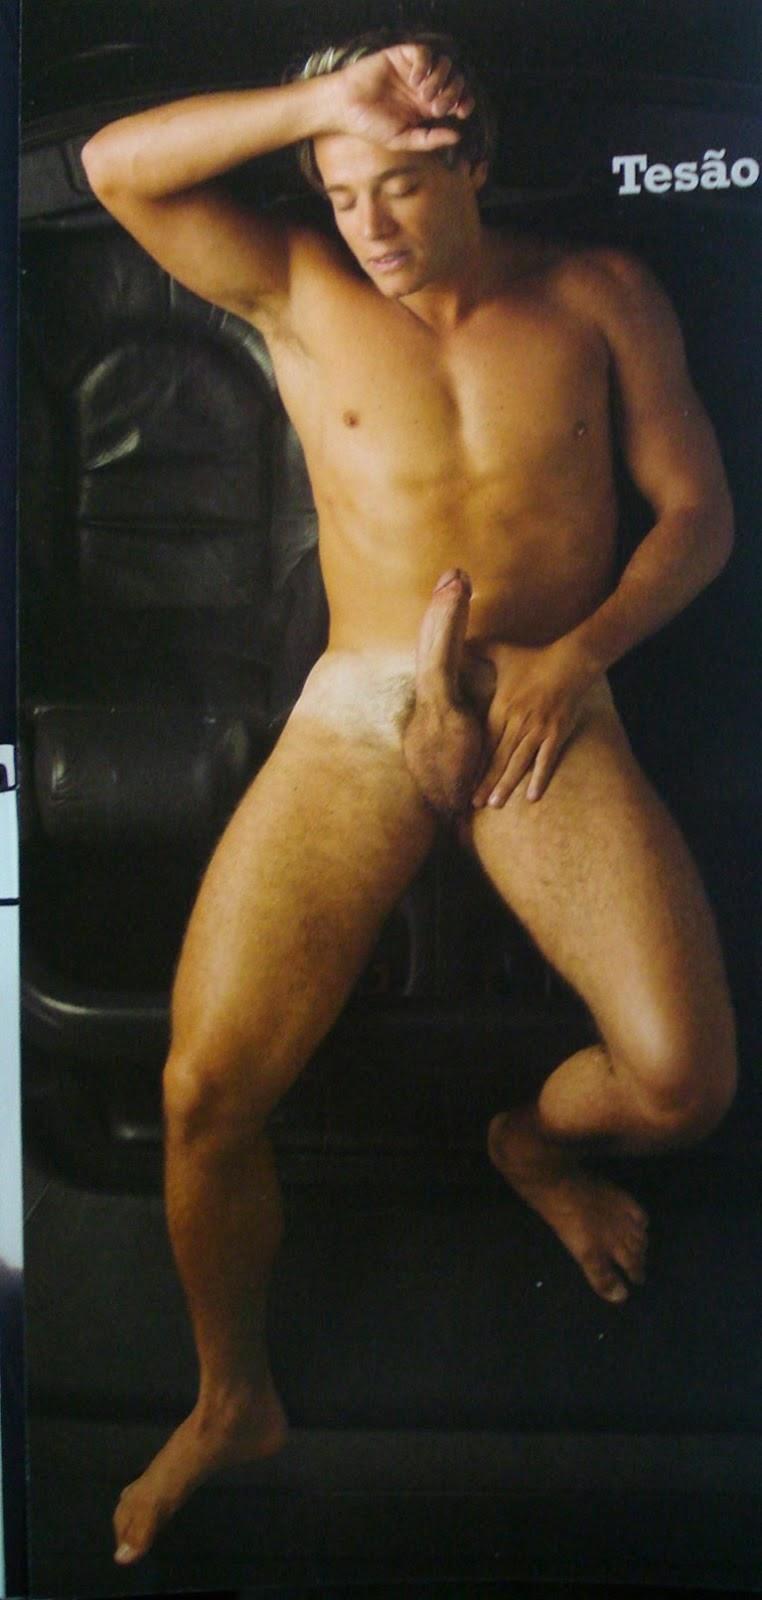 19 anos se masturbando e gozando no chuveiro 4